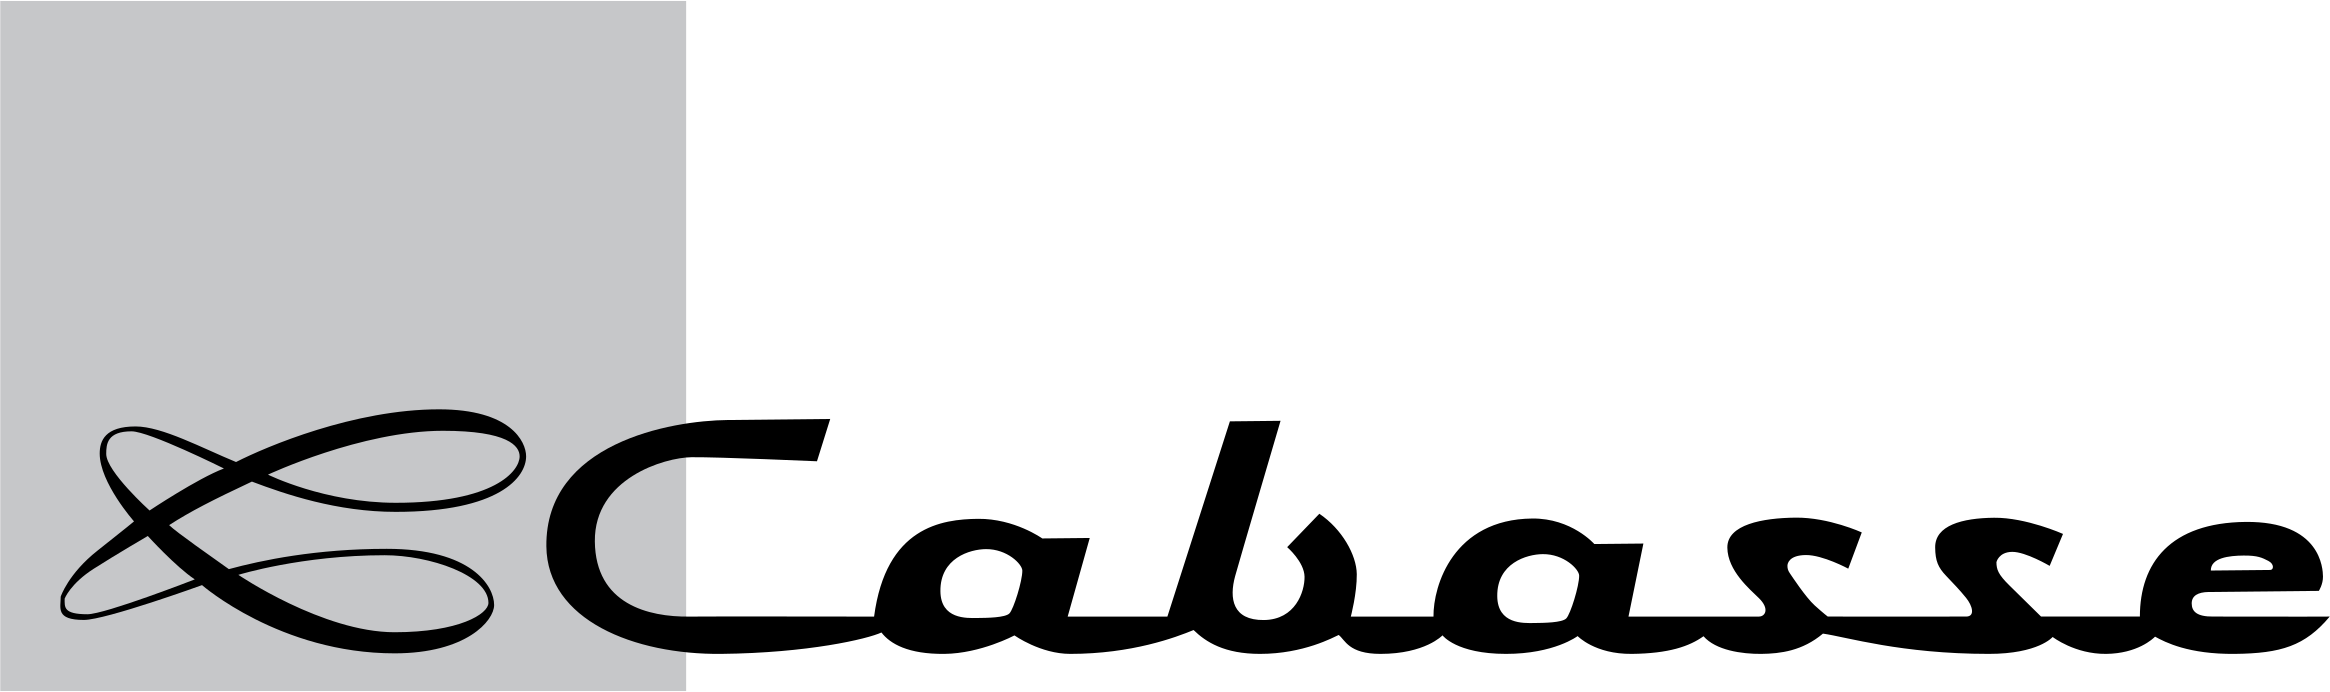 https://scowcroftandassociates.com/wp-content/uploads/2021/09/cabasse-logo-png-transparent-1.png